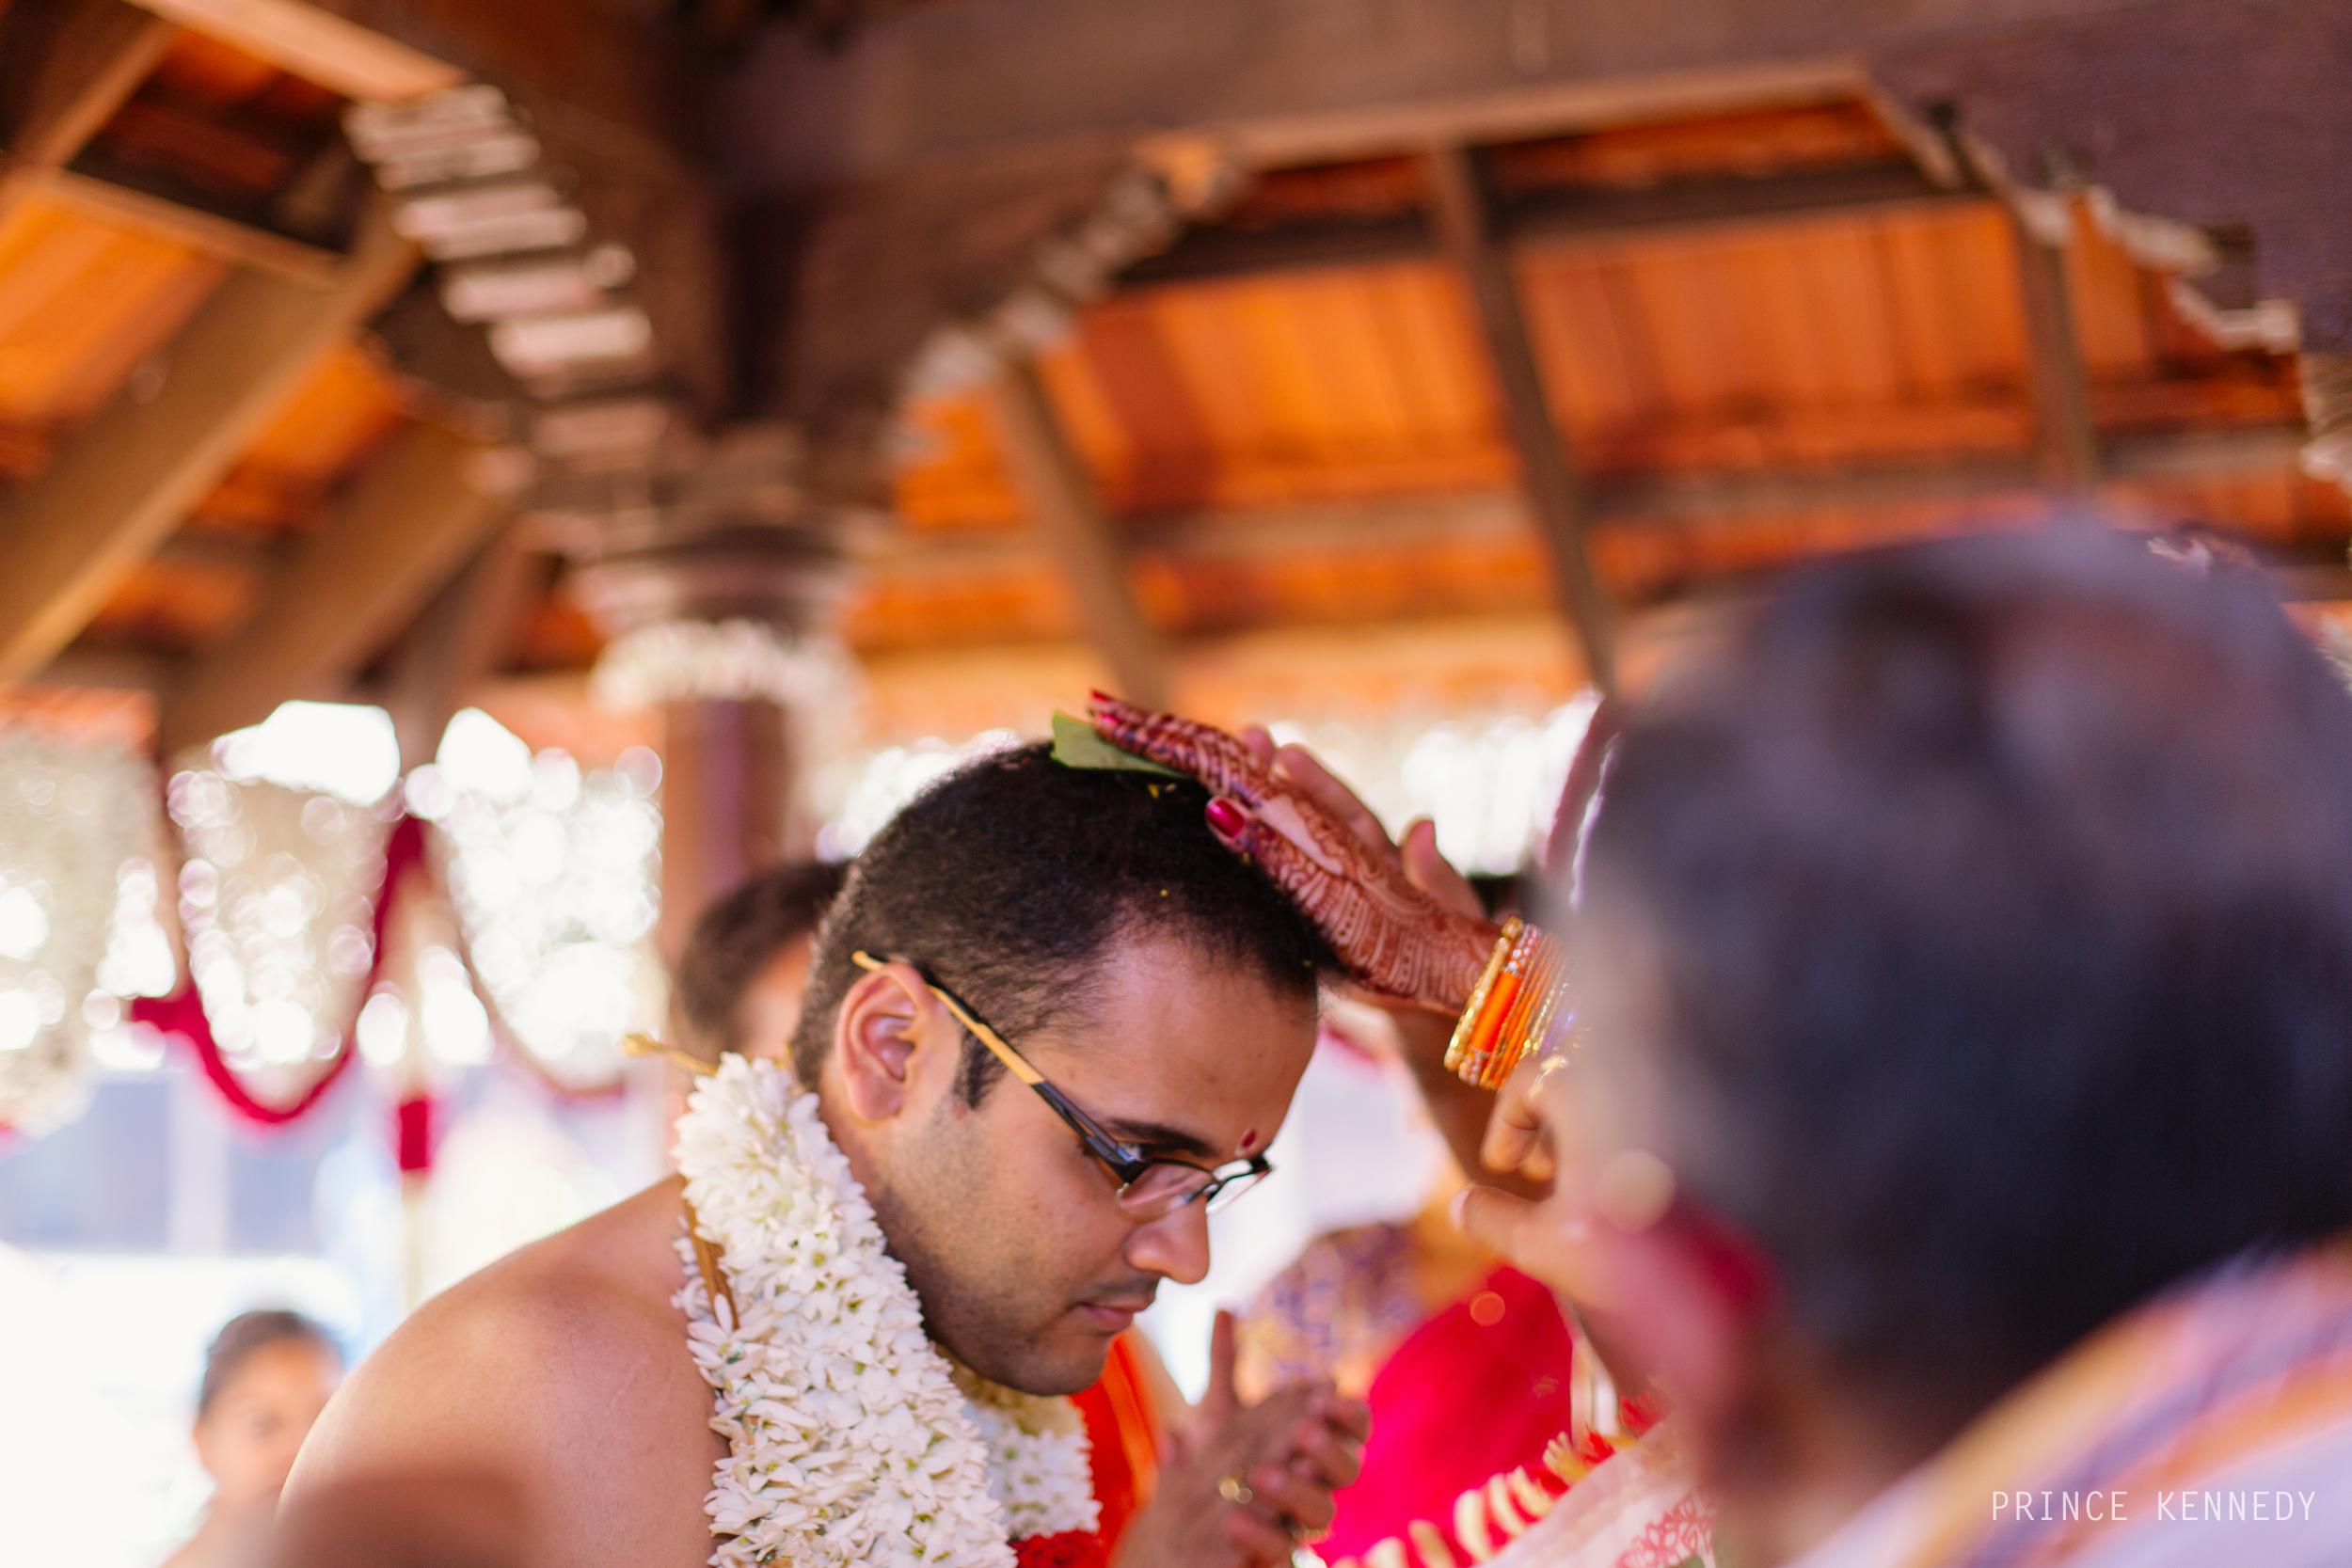 Athmajja-Nithesh-Engagement-Couple-Portrait-Portraiture-Wedding-Couple-Portrait-Chennai-Photographer-Candid-Photography-Destination-Best-Prince-Kennedy-Photography-241.jpg